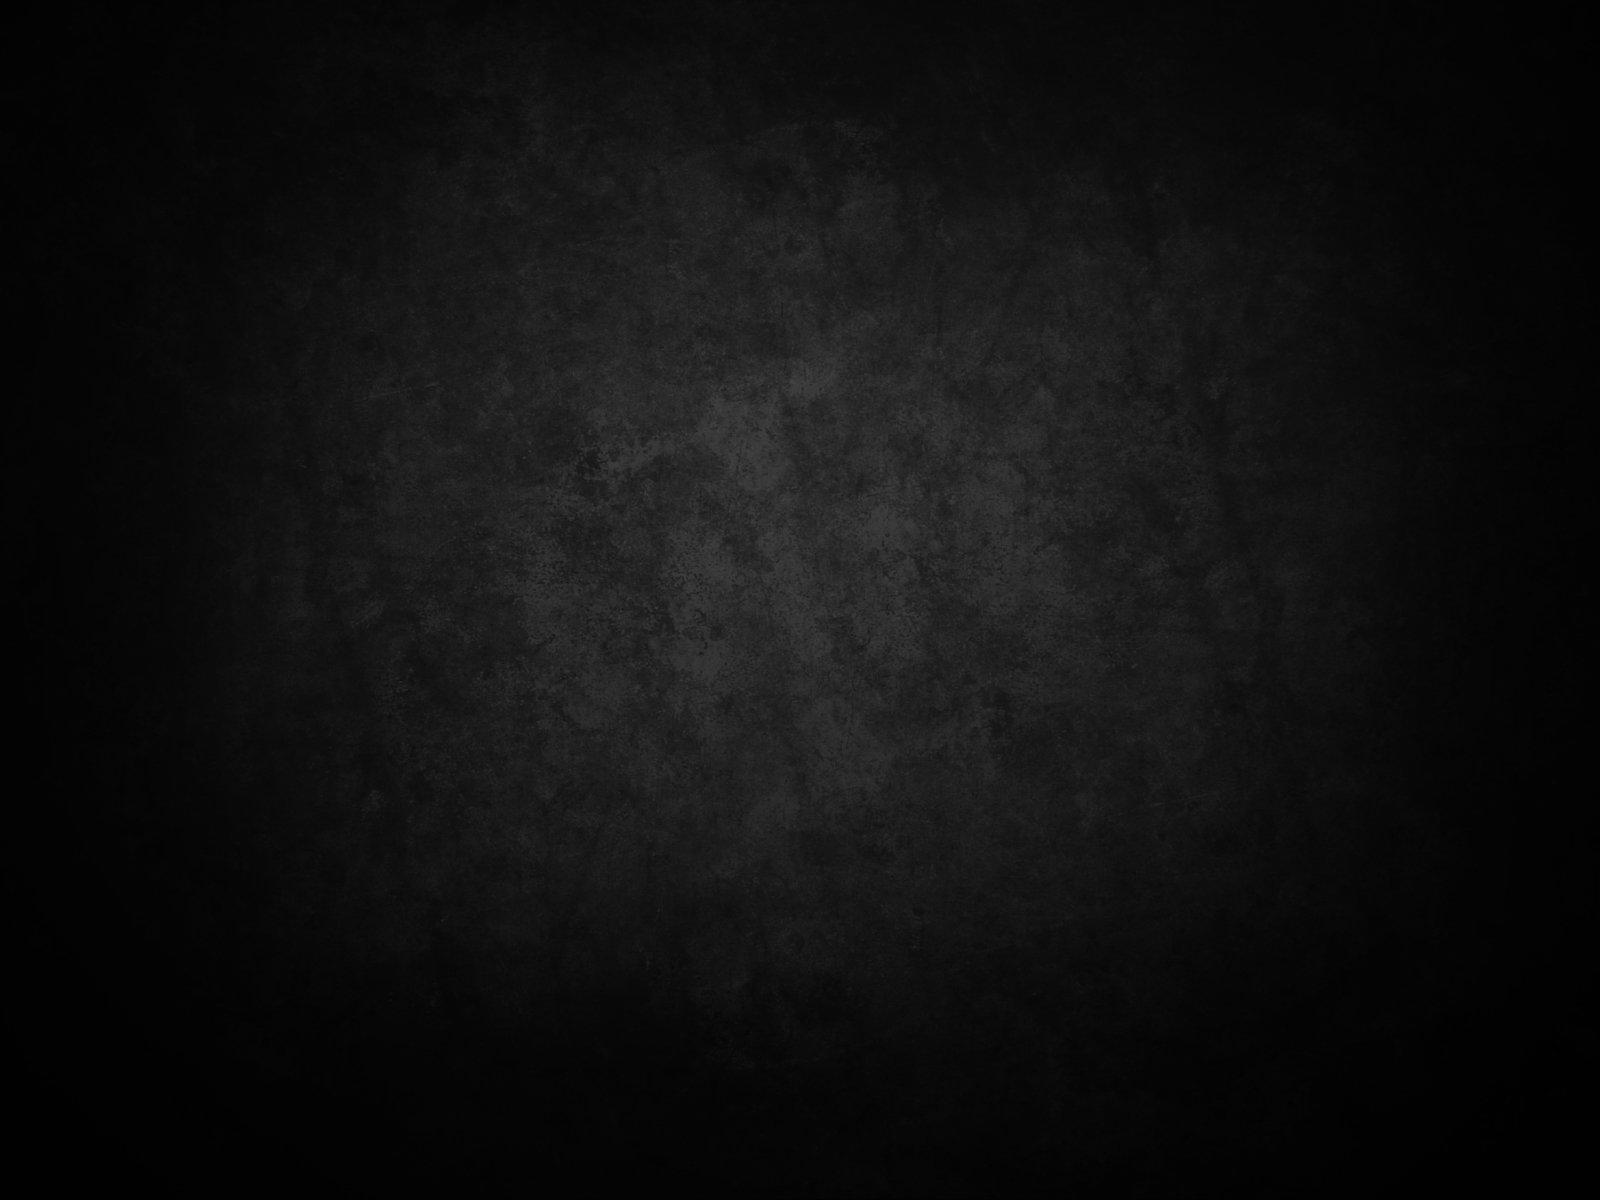 Black pictures - ClipartFox